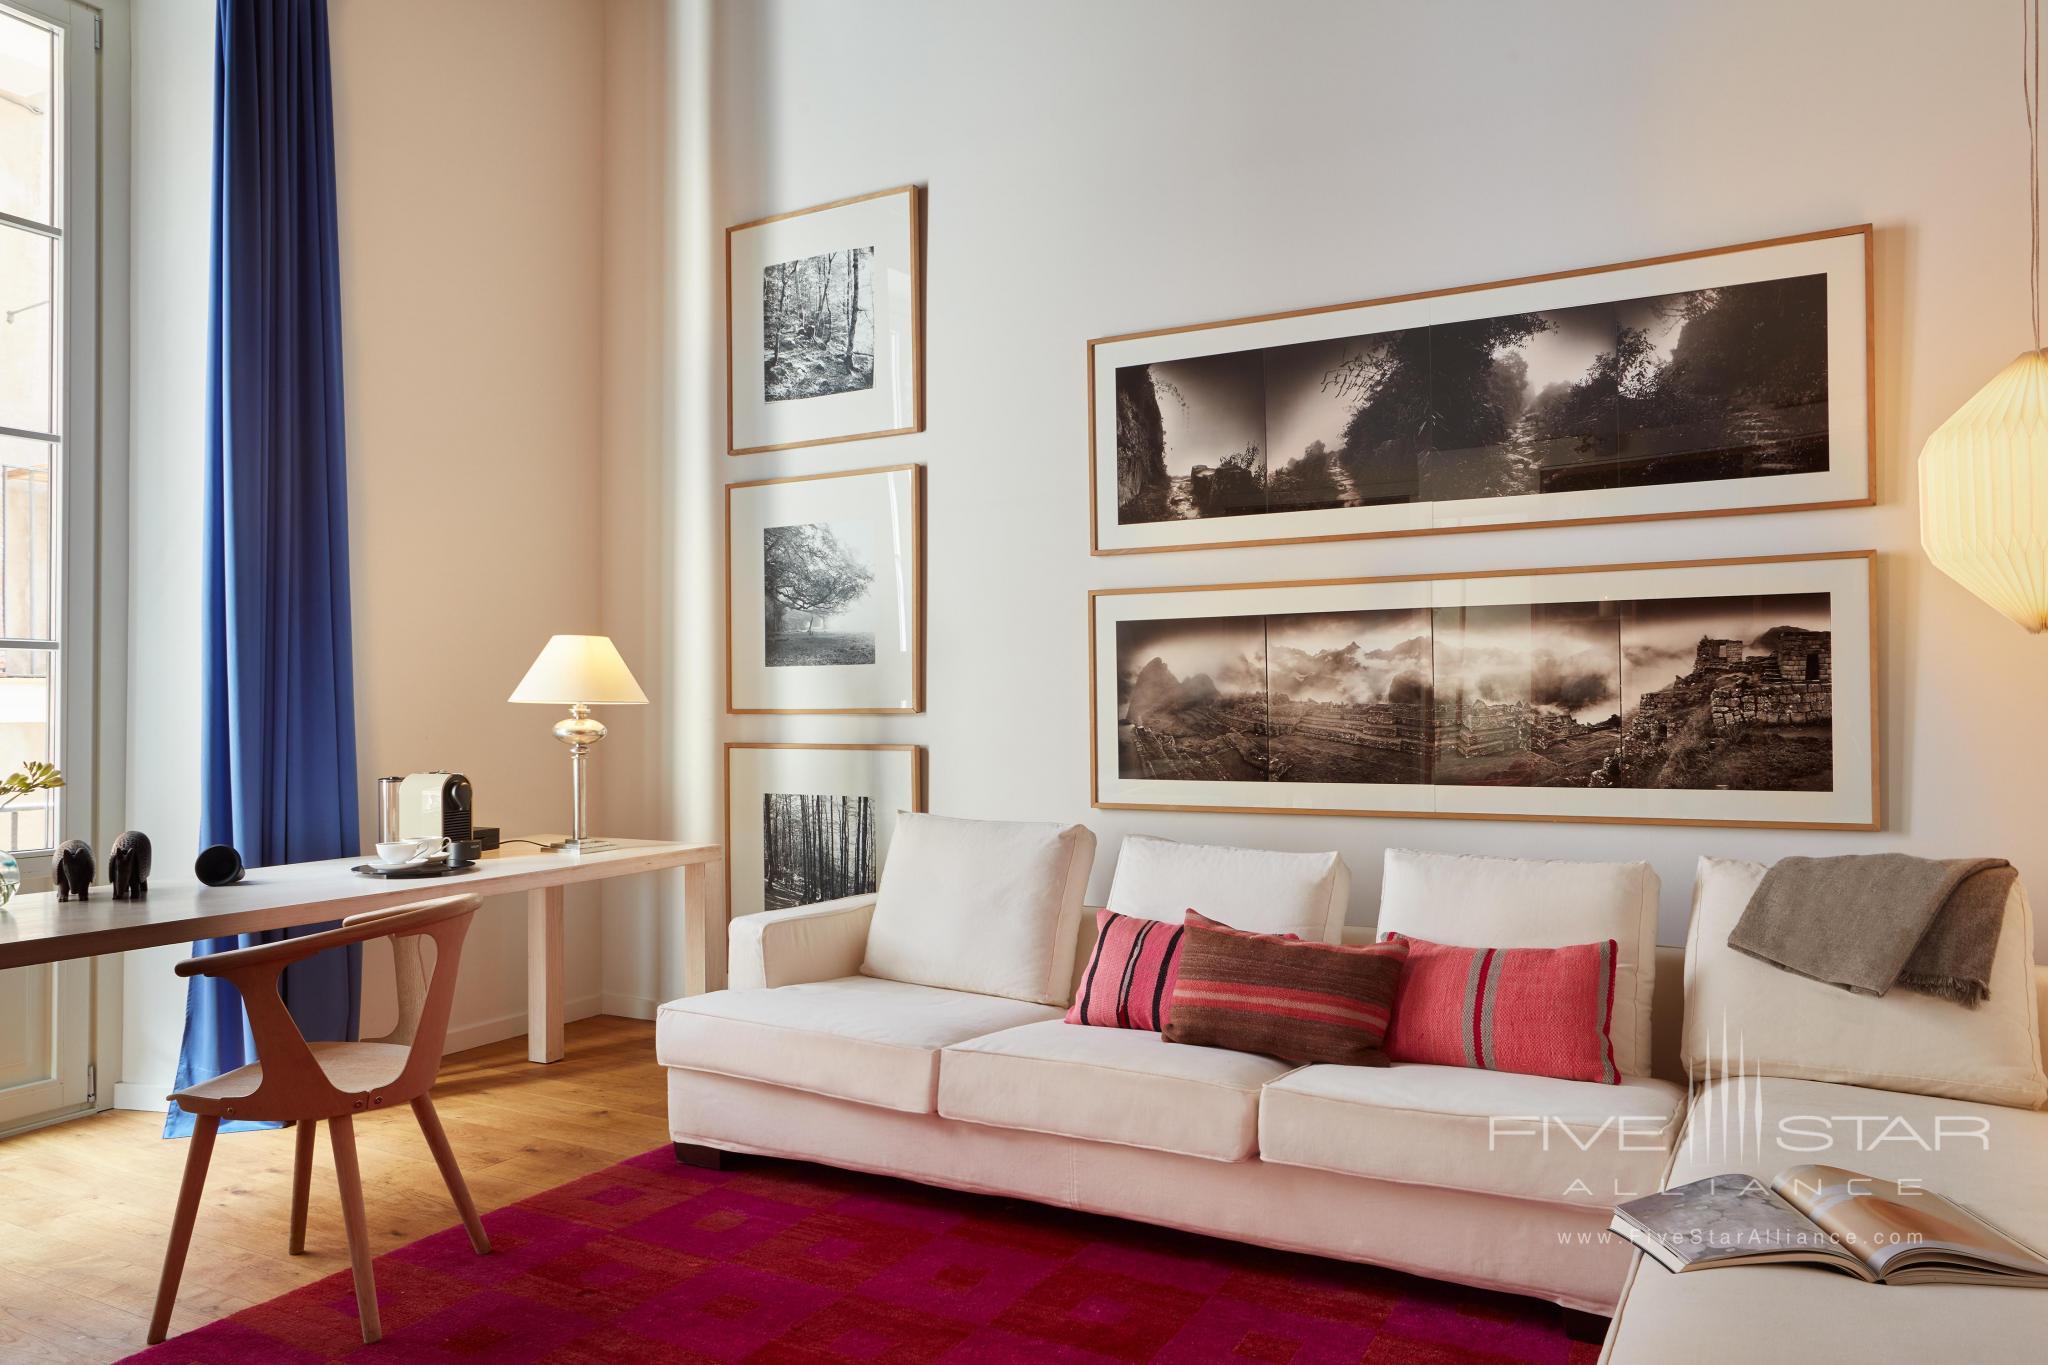 Neri Hotel Barcelona Suite